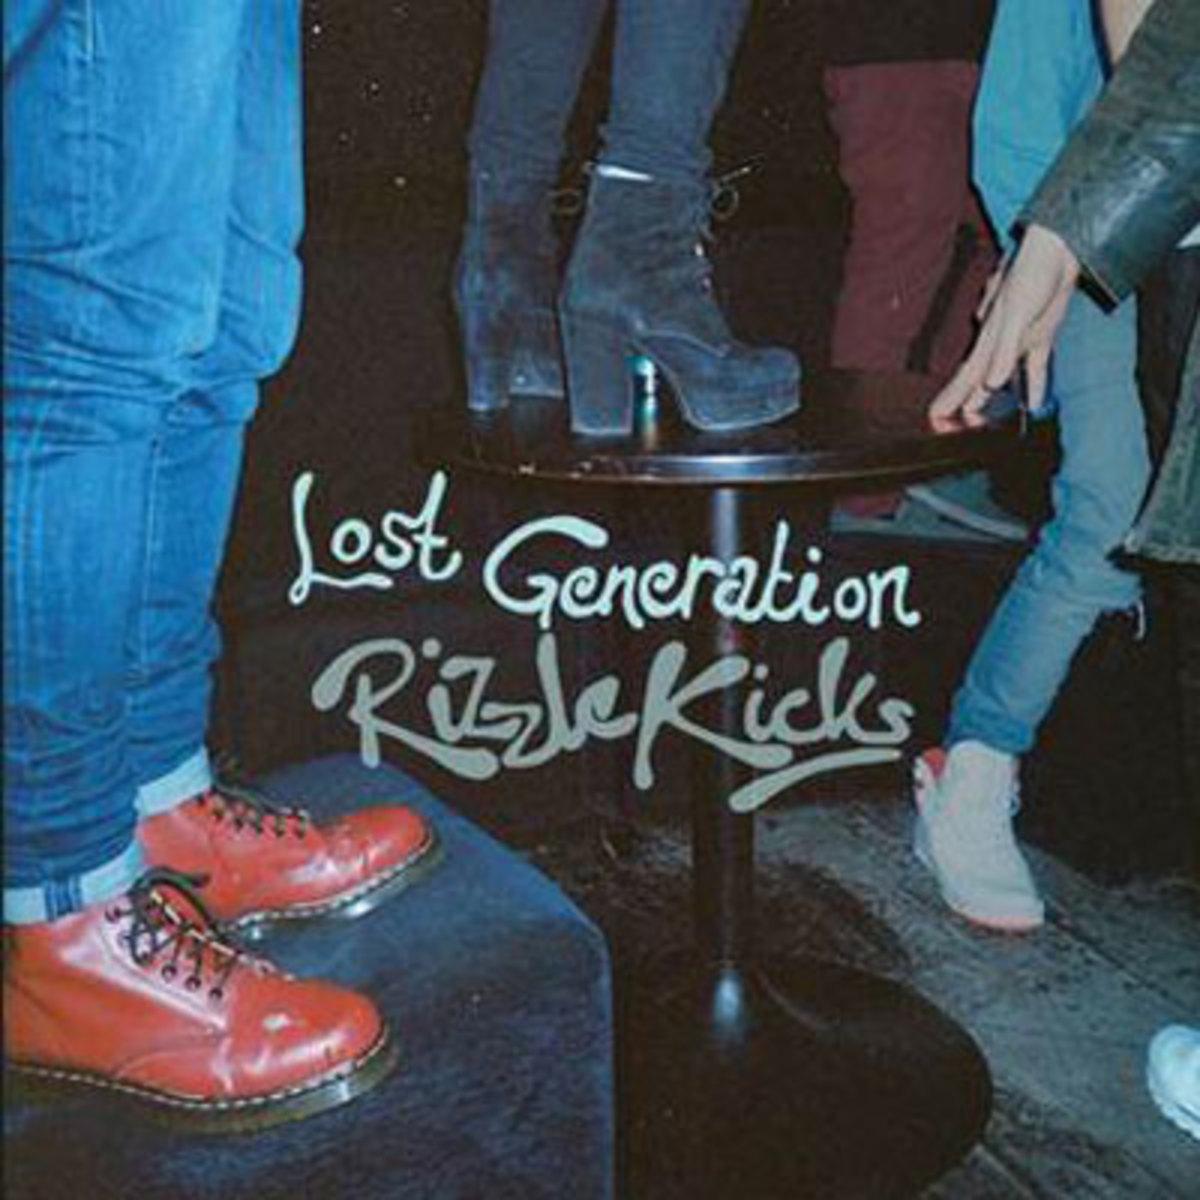 rizzlekicks-lostgeneration.jpg